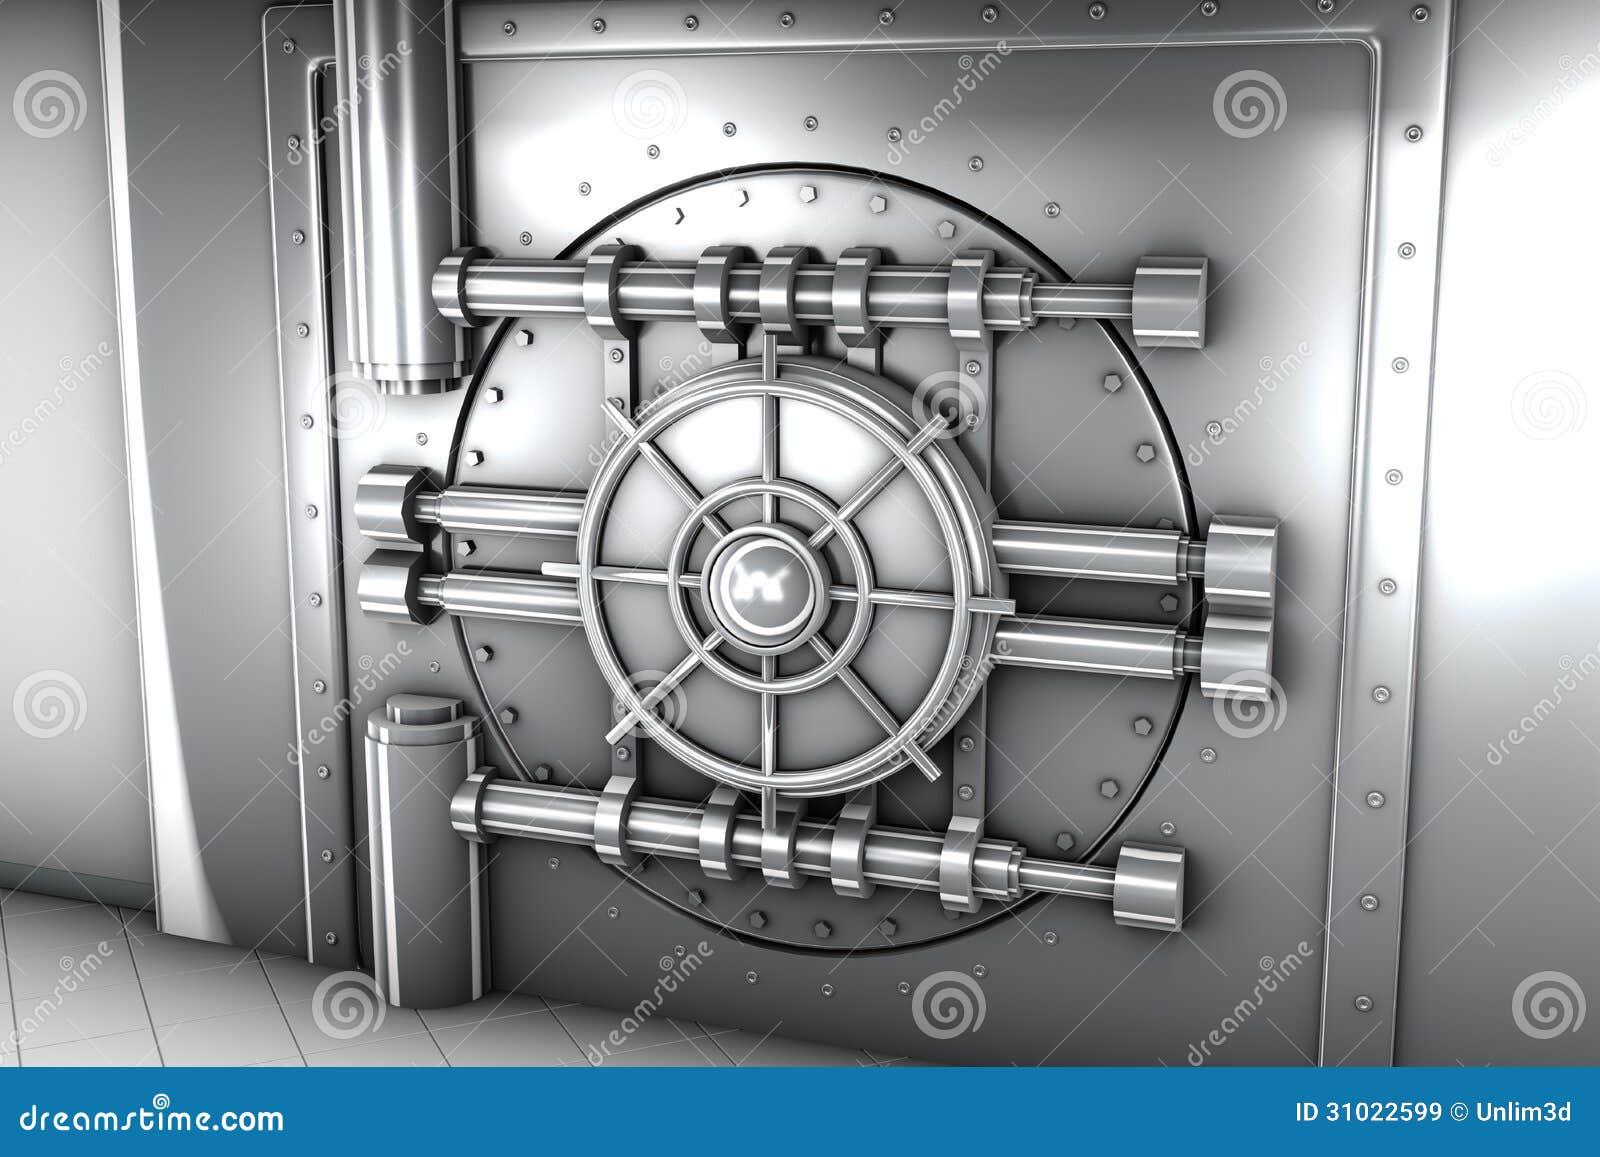 Illustration Of Bank Vault Door Front View Royalty Free